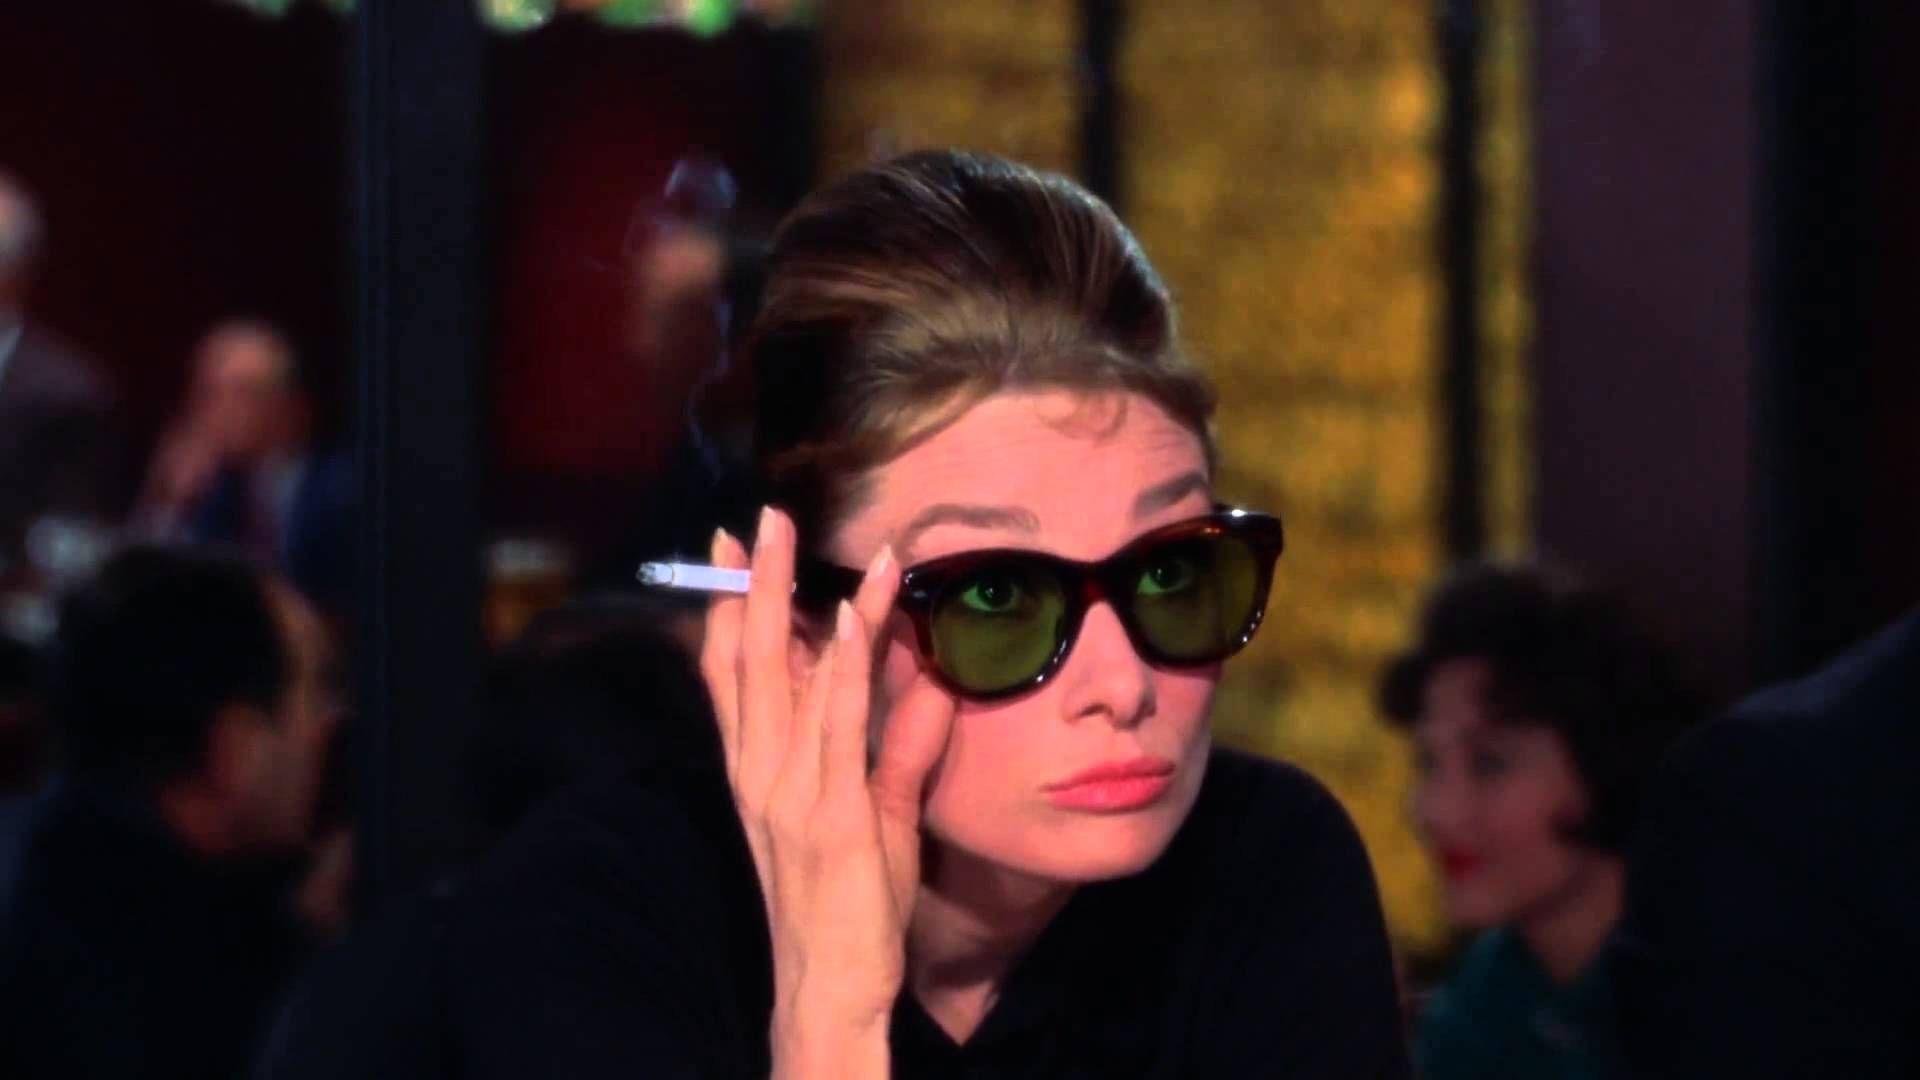 a3af60664e22 Breakfast at Tiffany s - DELETED STRIPPER SCENE (9) - Audrey Hepburn ...